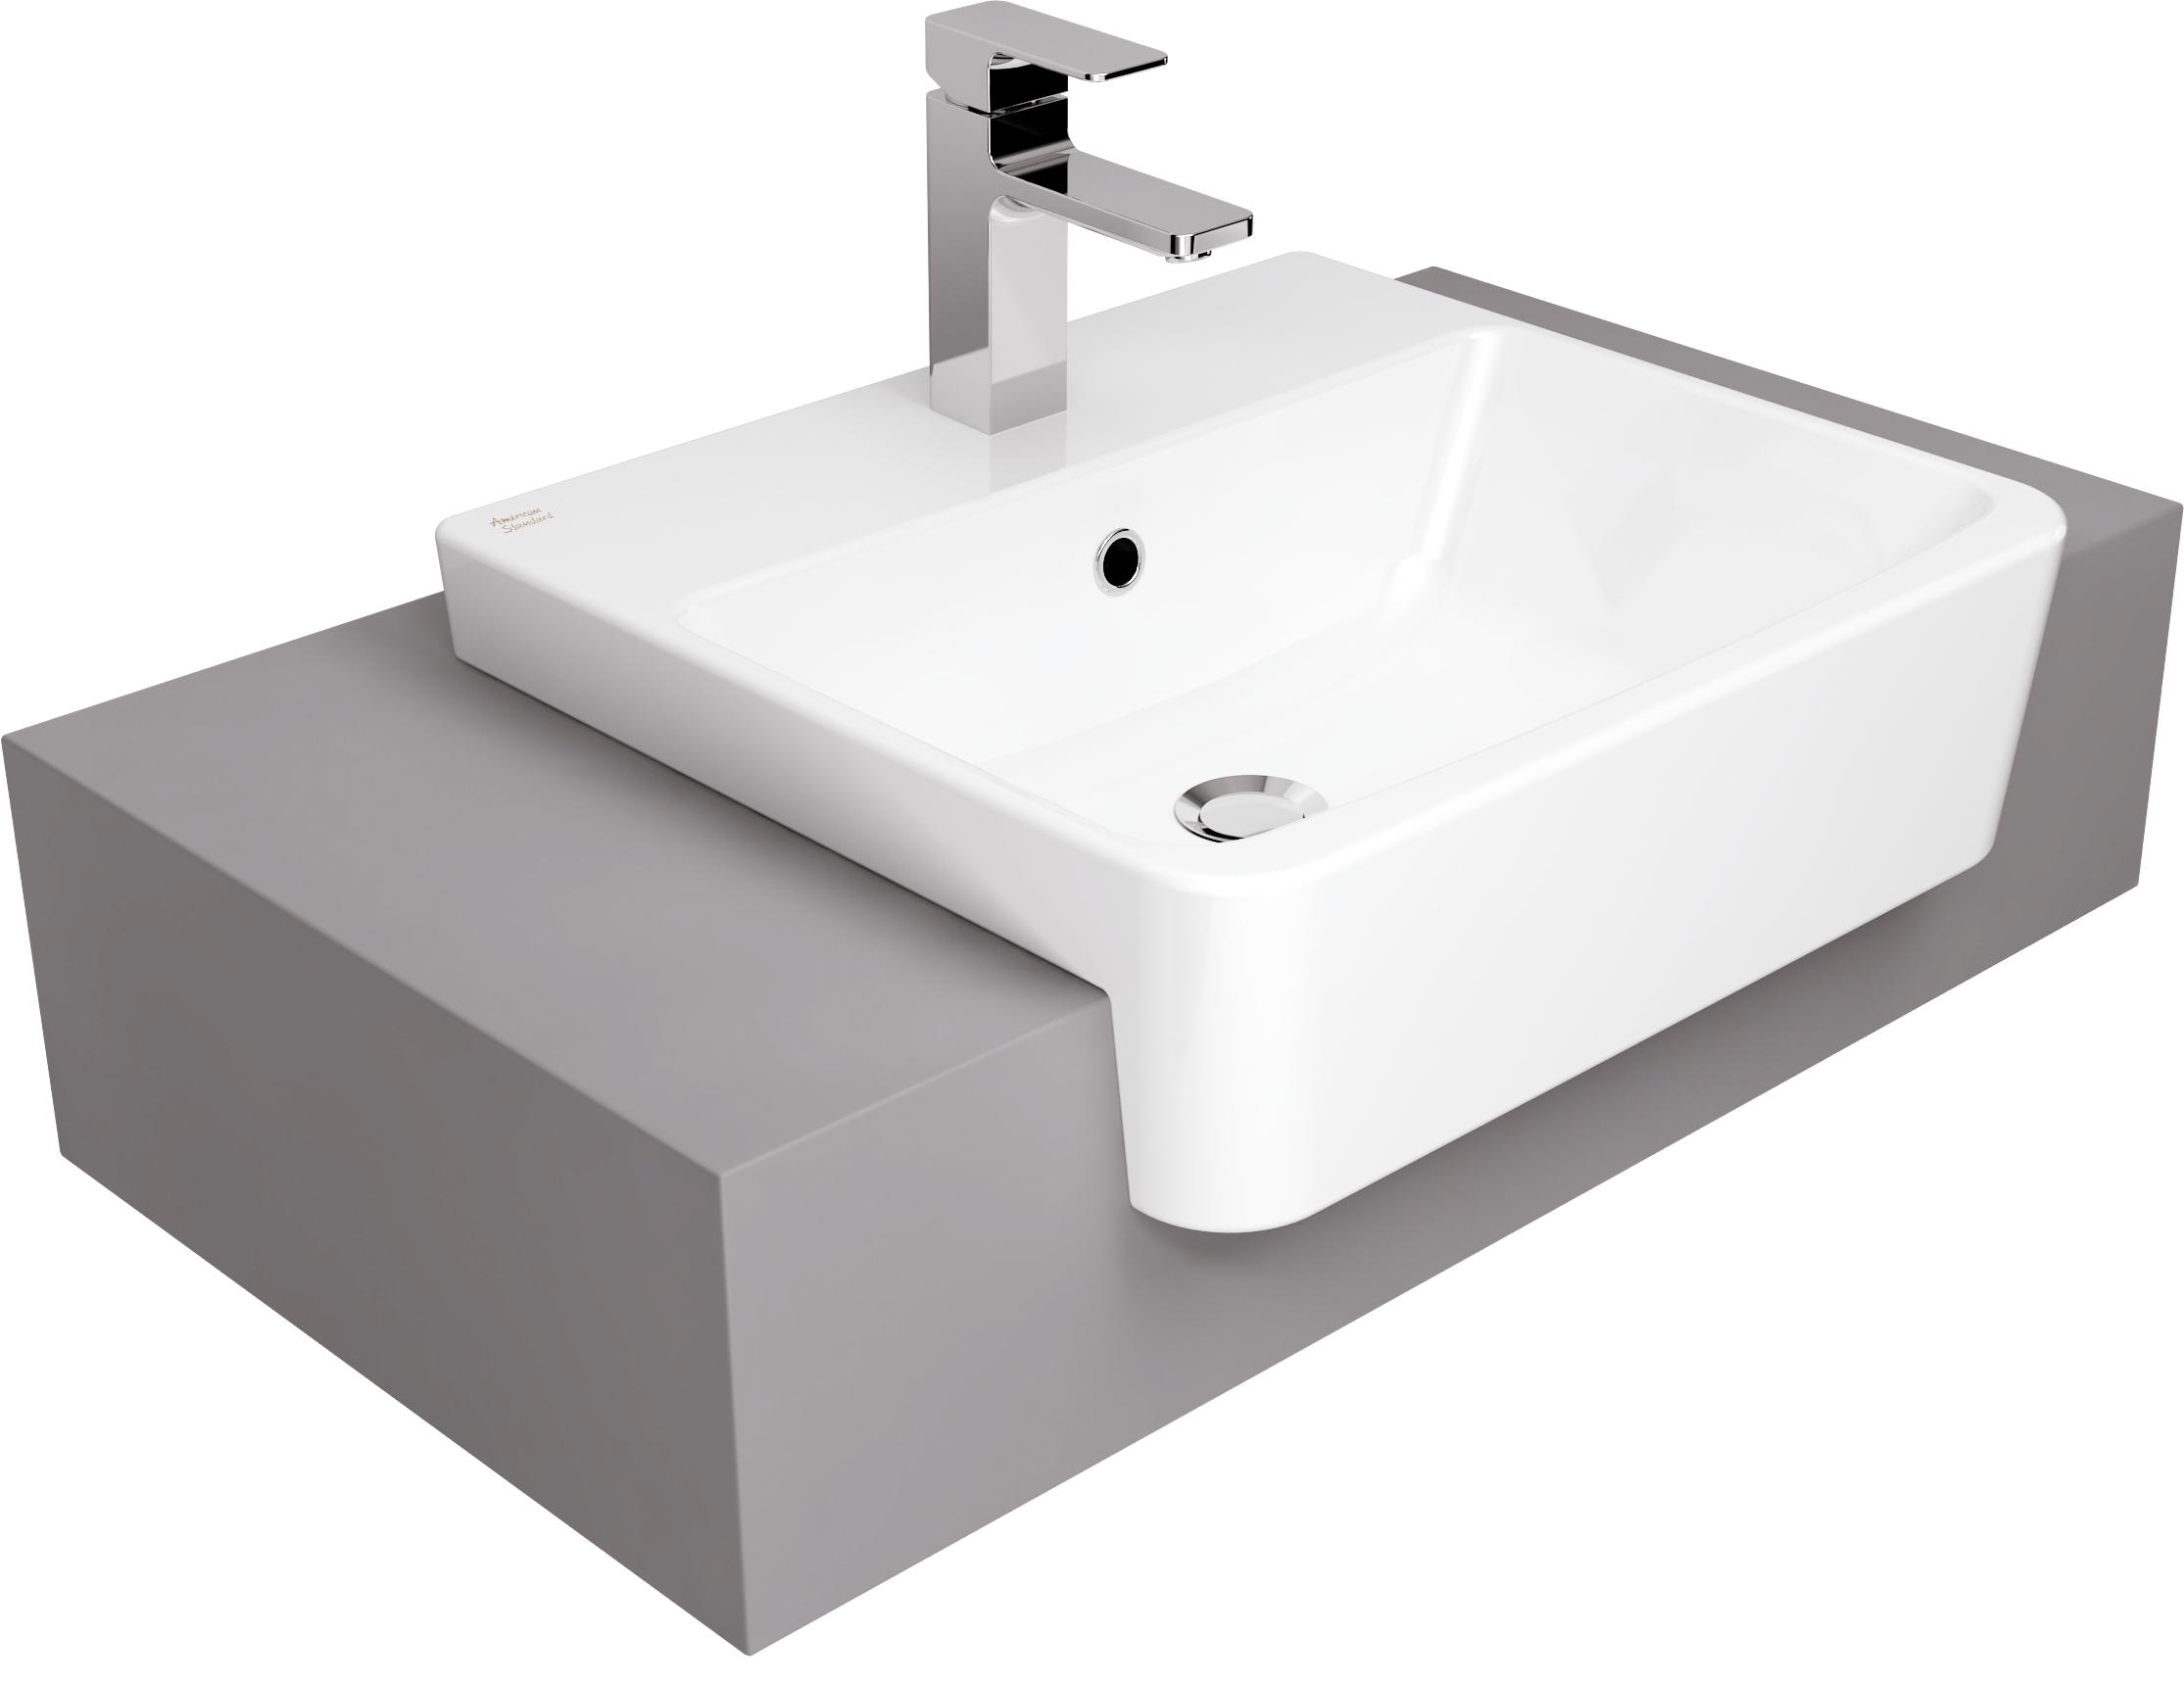 Acacia E Semi Recessed Basin Ideal Kitchen Amp Bathroom